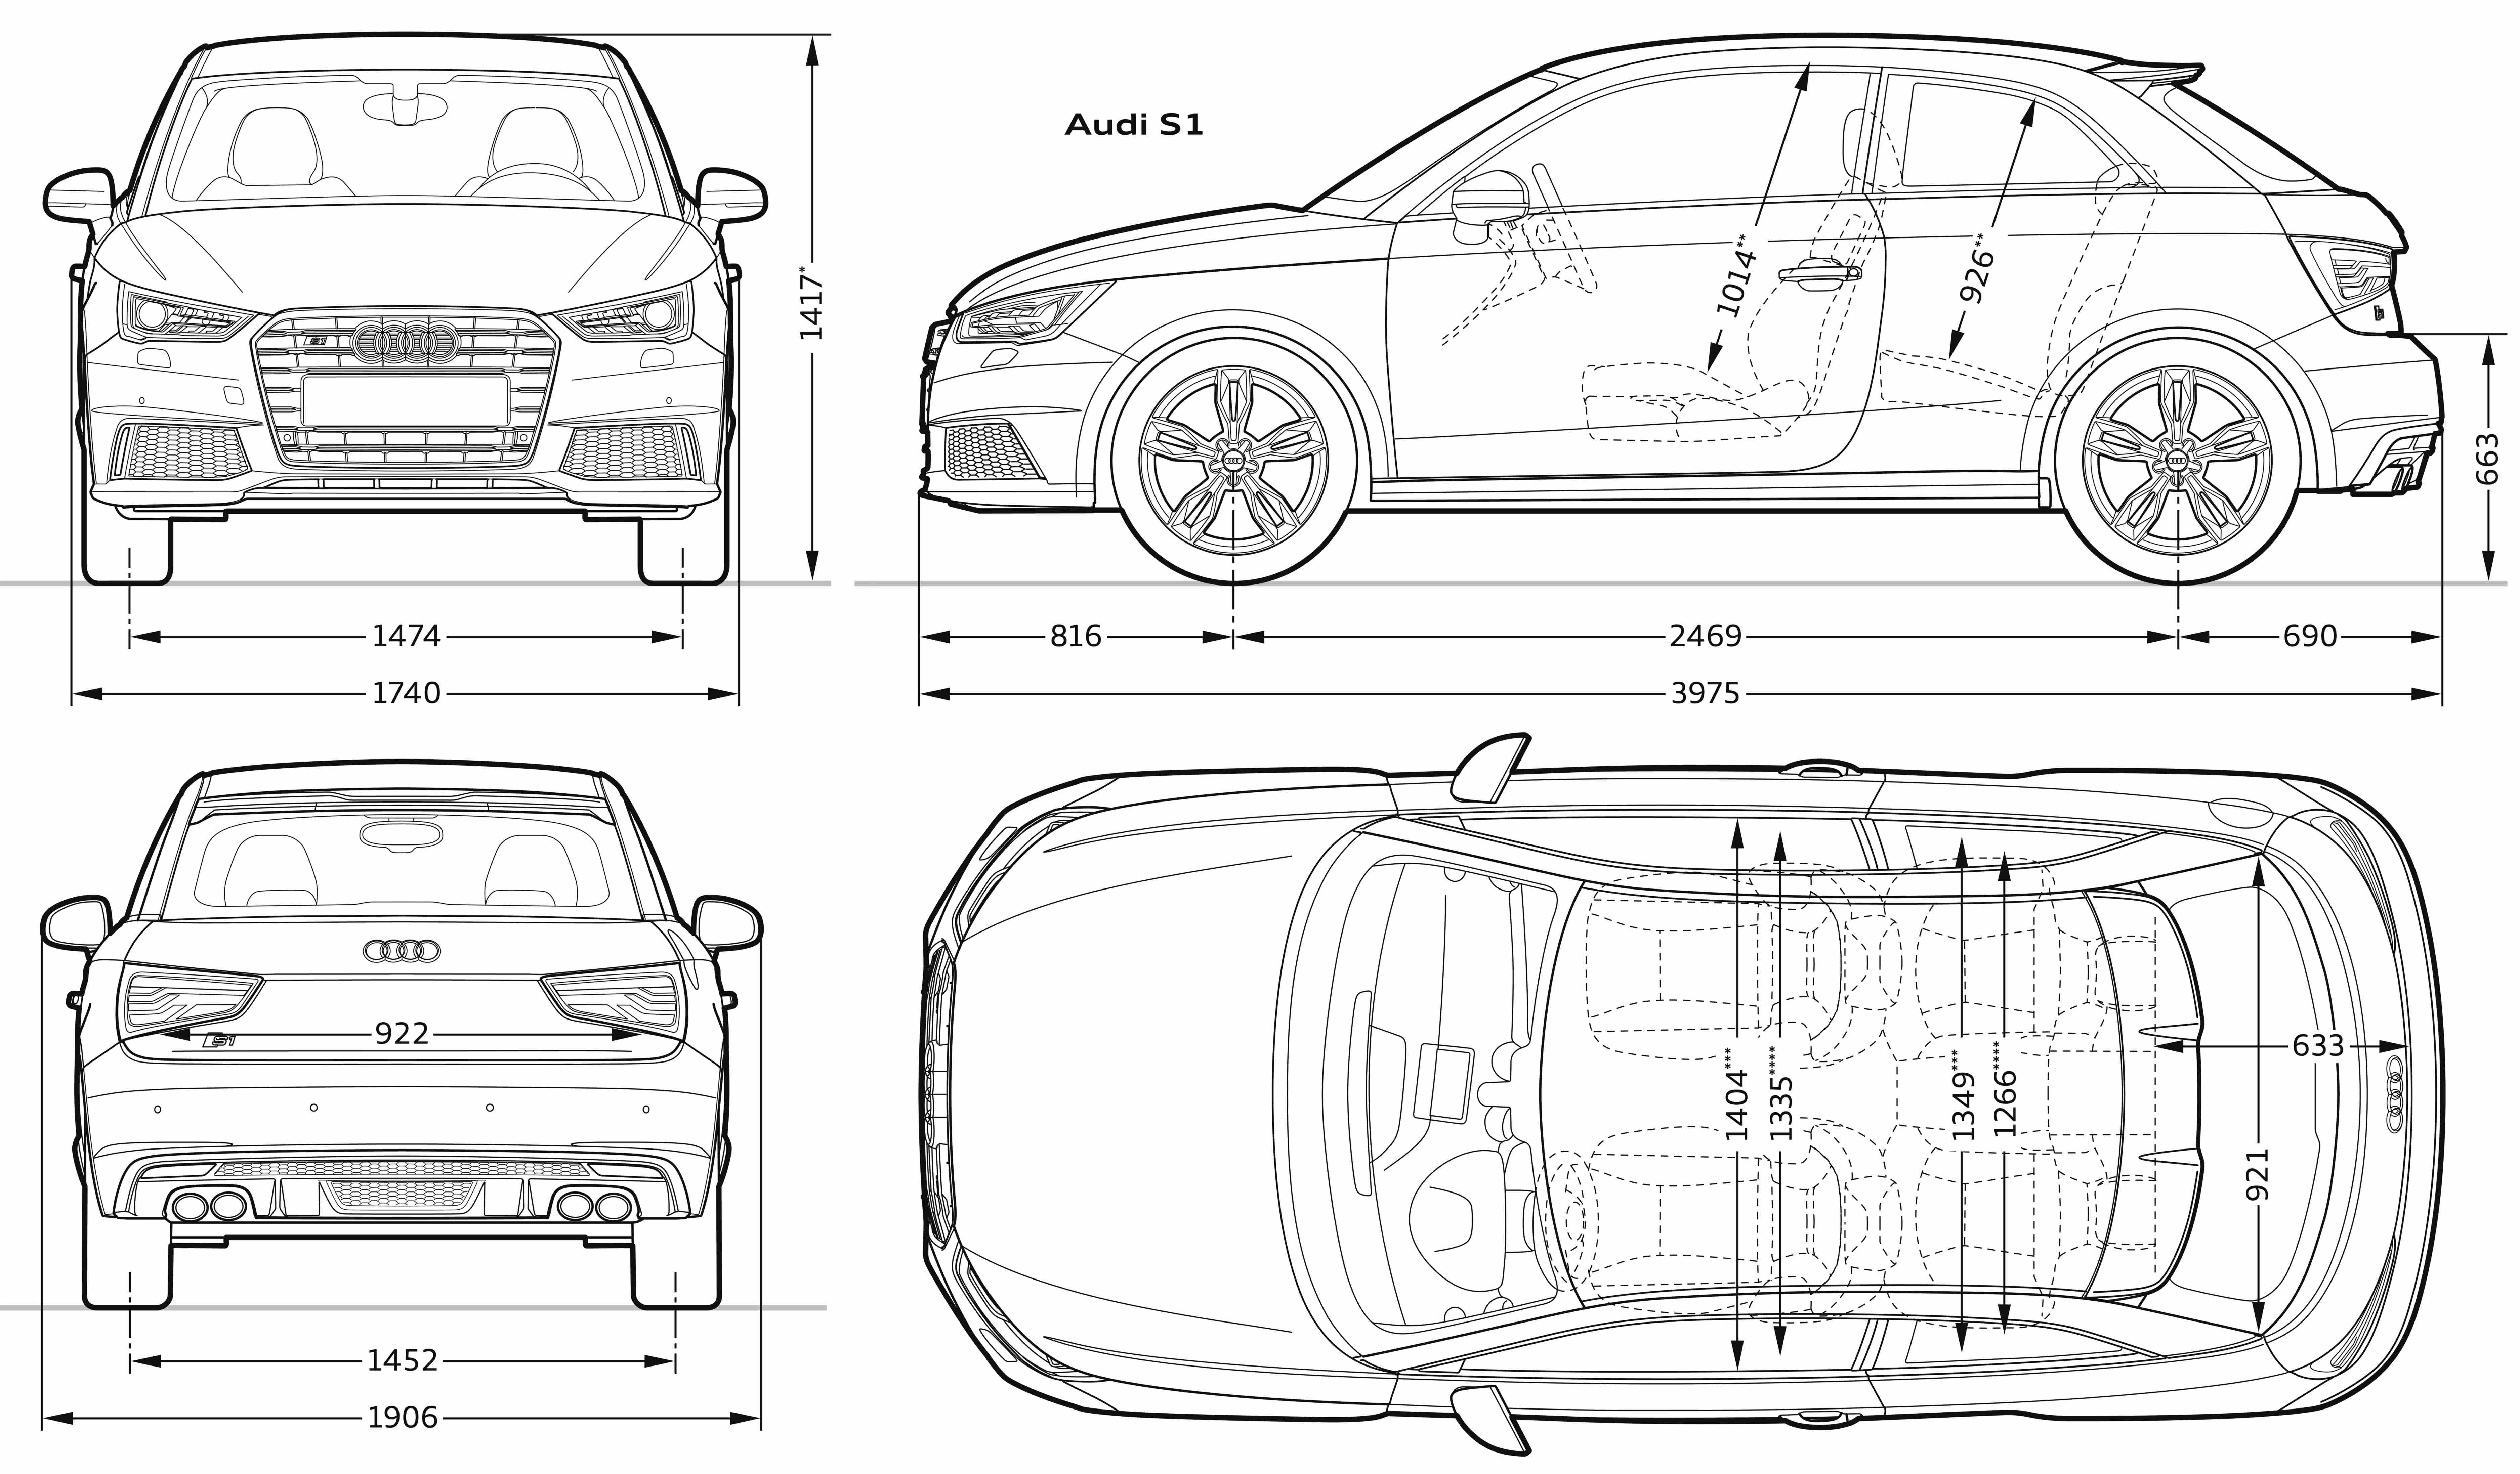 Audi S1 blueprint